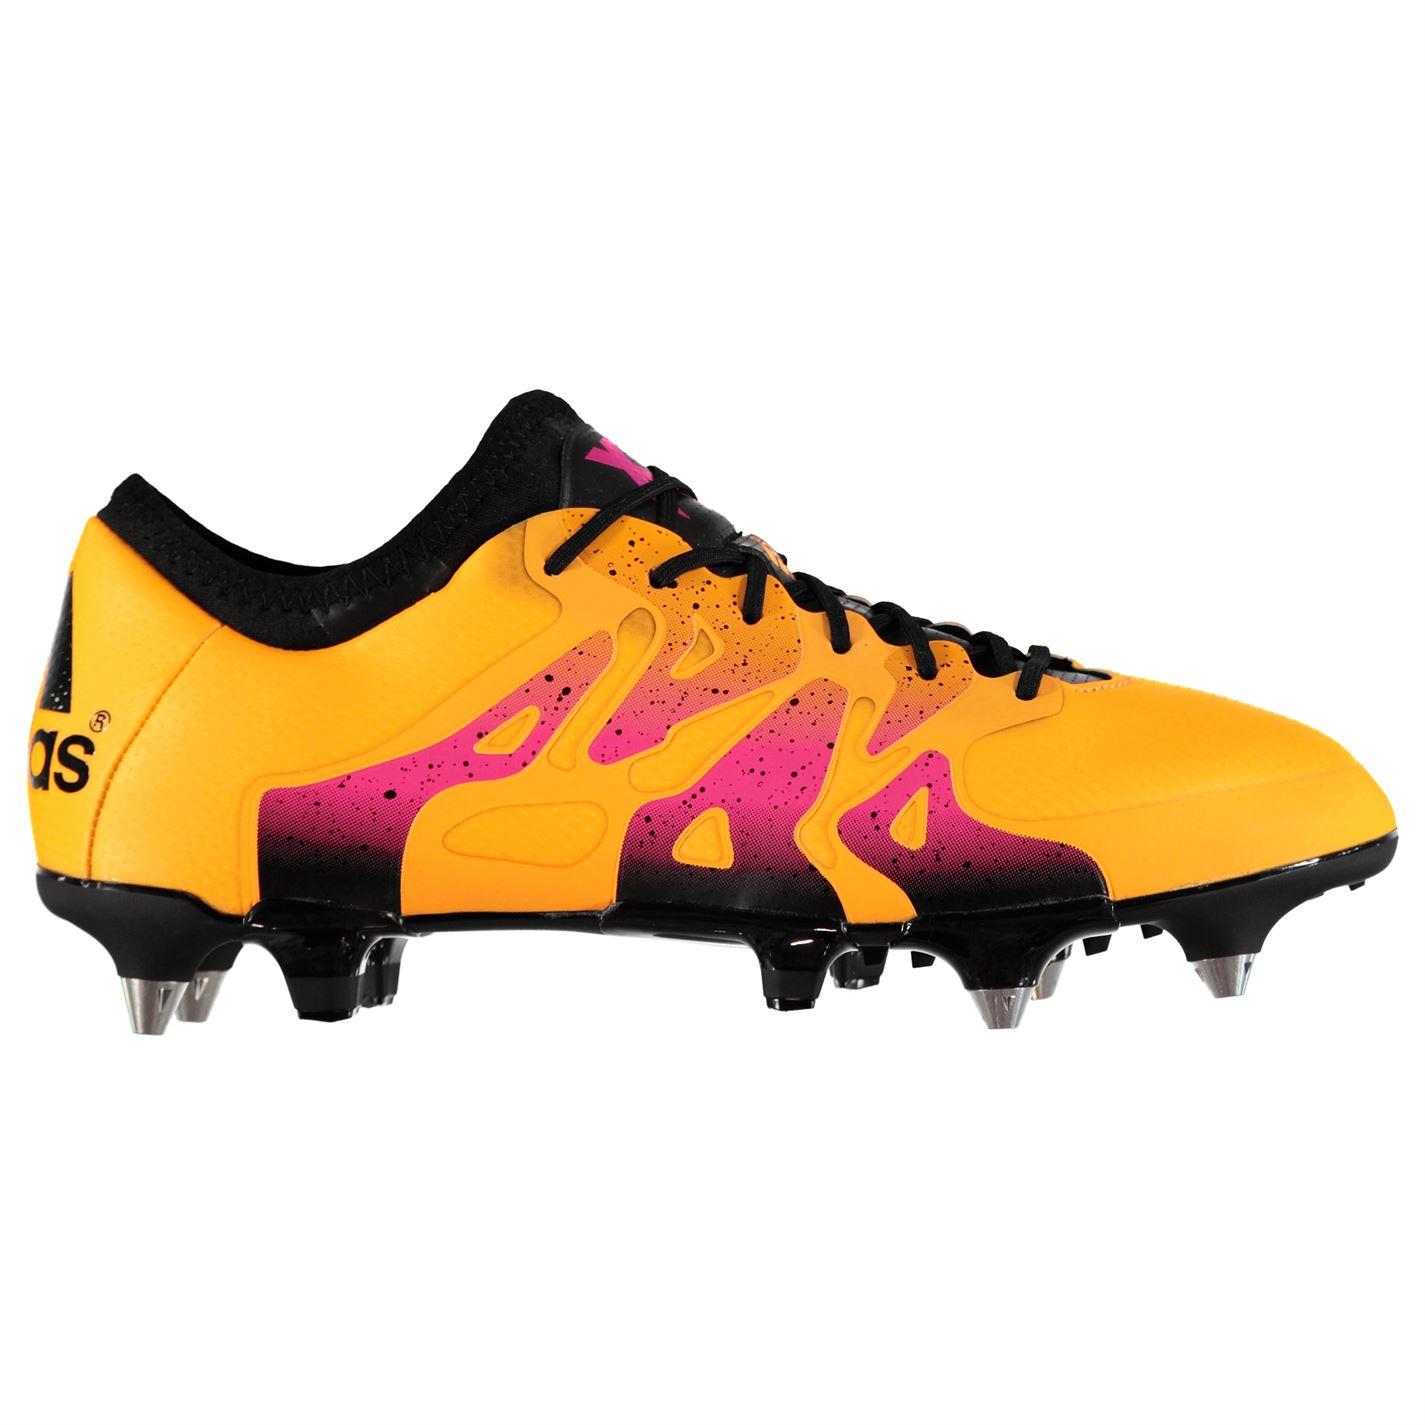 brand new 1ce6f 37416 Adidas X 15.1 SG Solar Gold Black Mens Football Boots